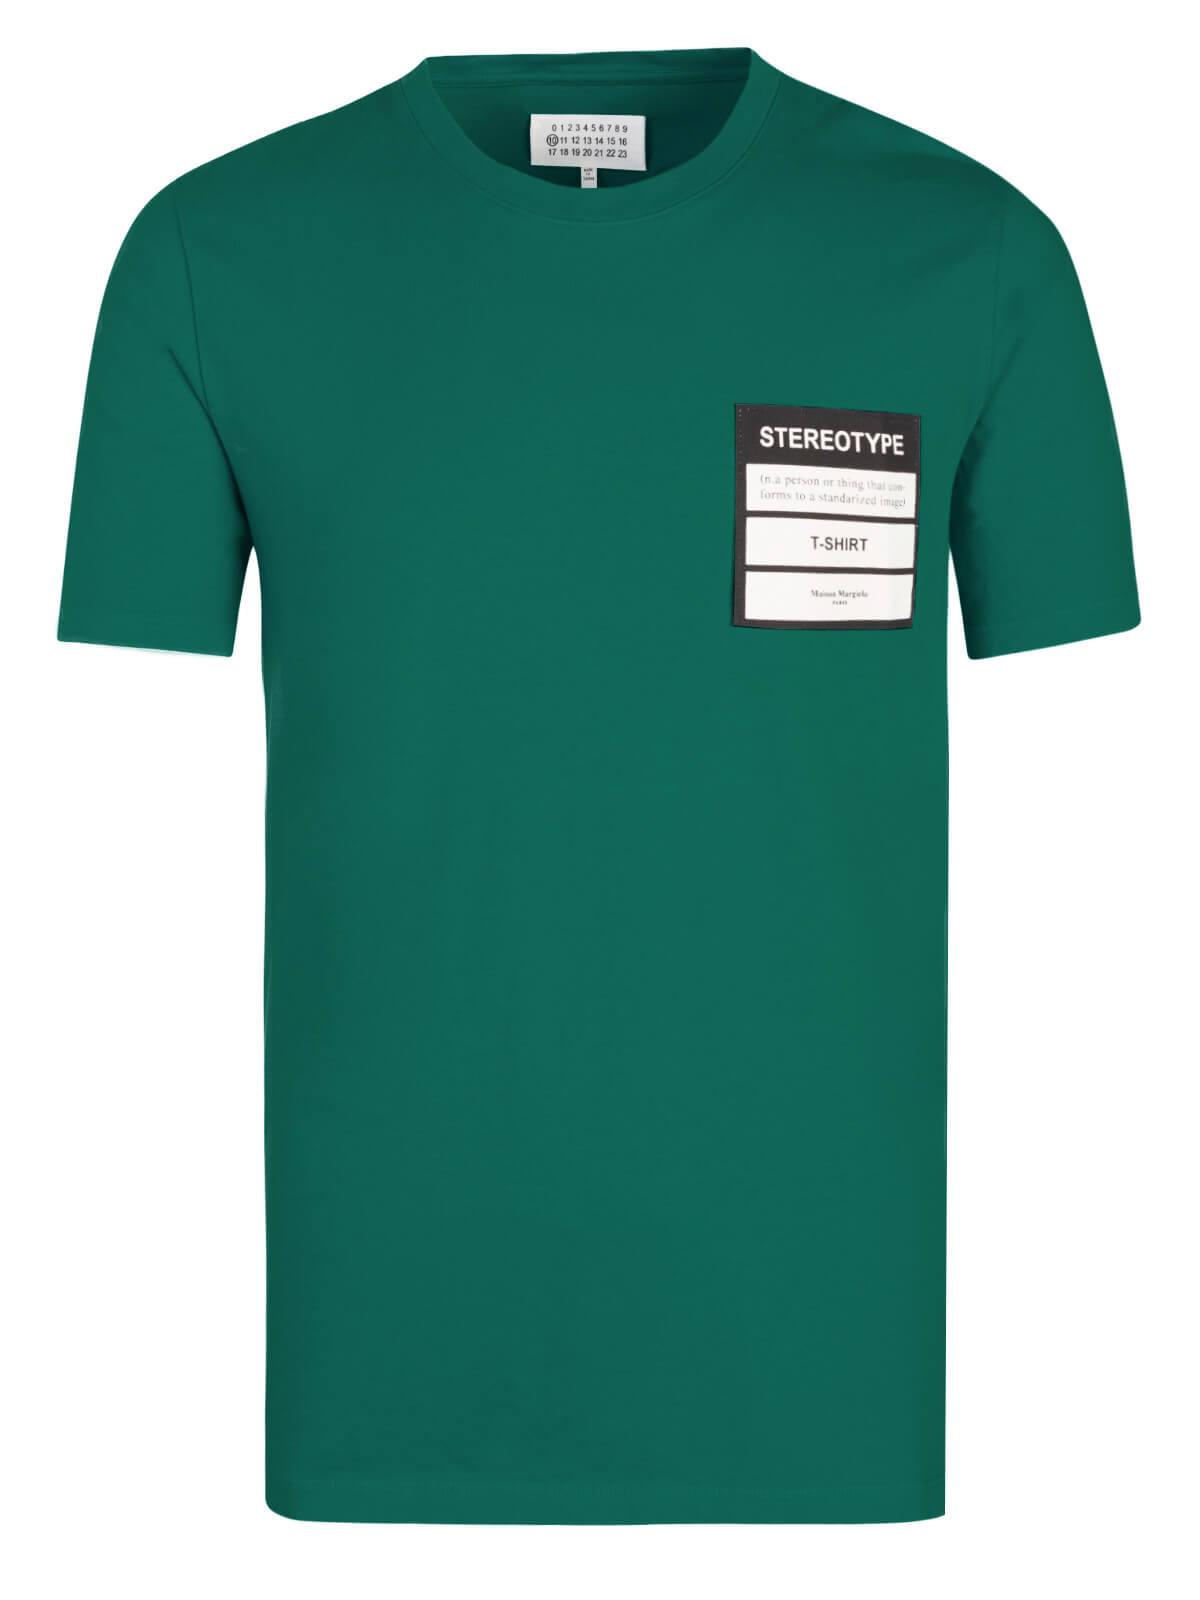 Maison Martin Margiela  T Shirt Green by Maison Martin Margiela